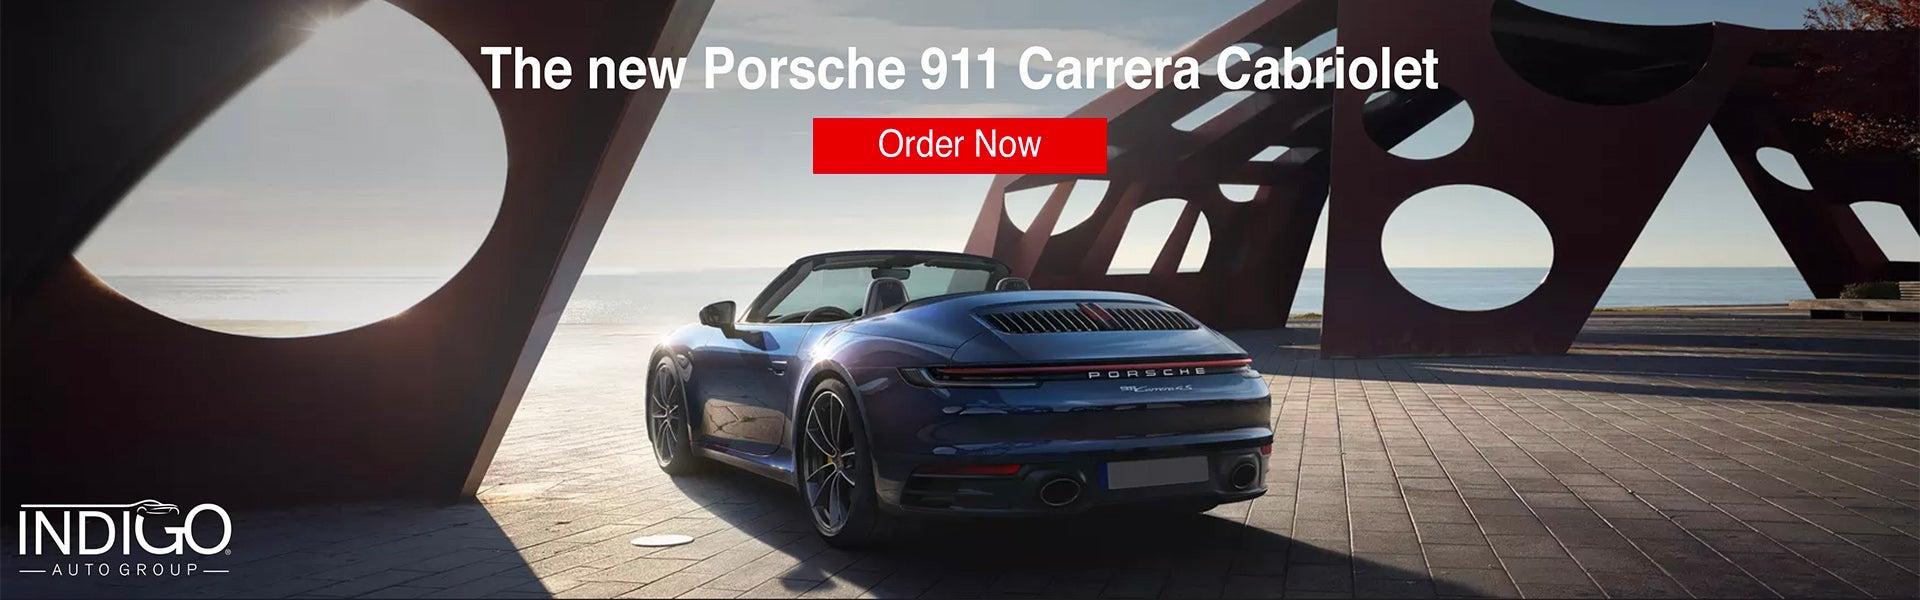 2020 Porsche 911 Carrera Cabriolet Order Now